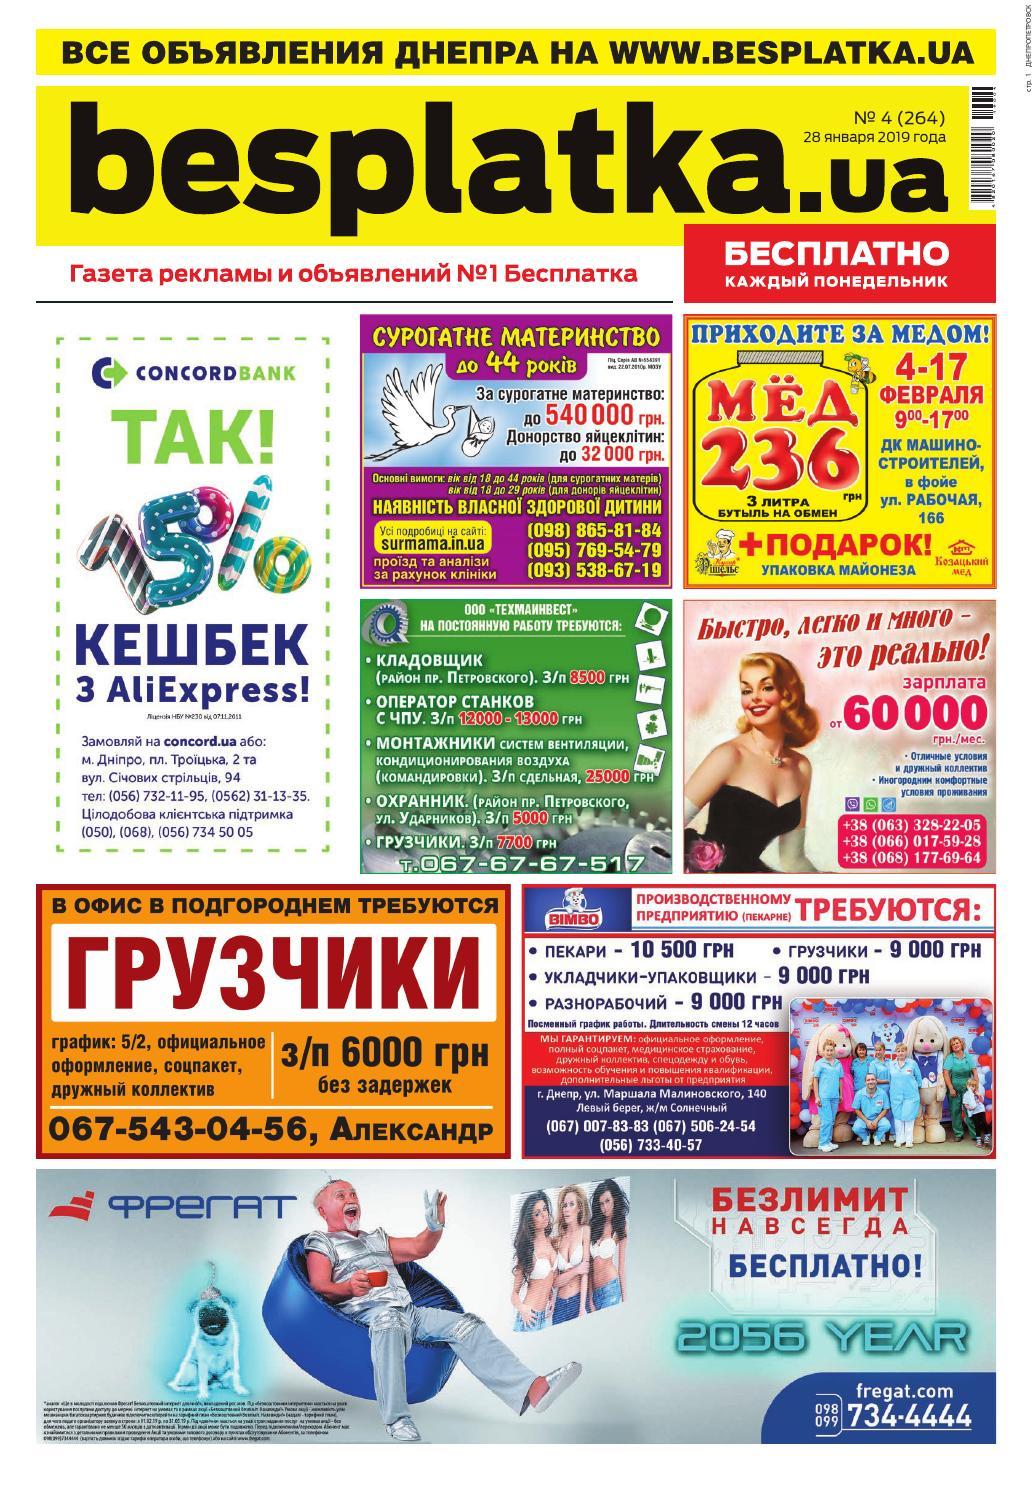 0ec7aa9bc Besplatka #4 Днепр by besplatka ukraine - issuu